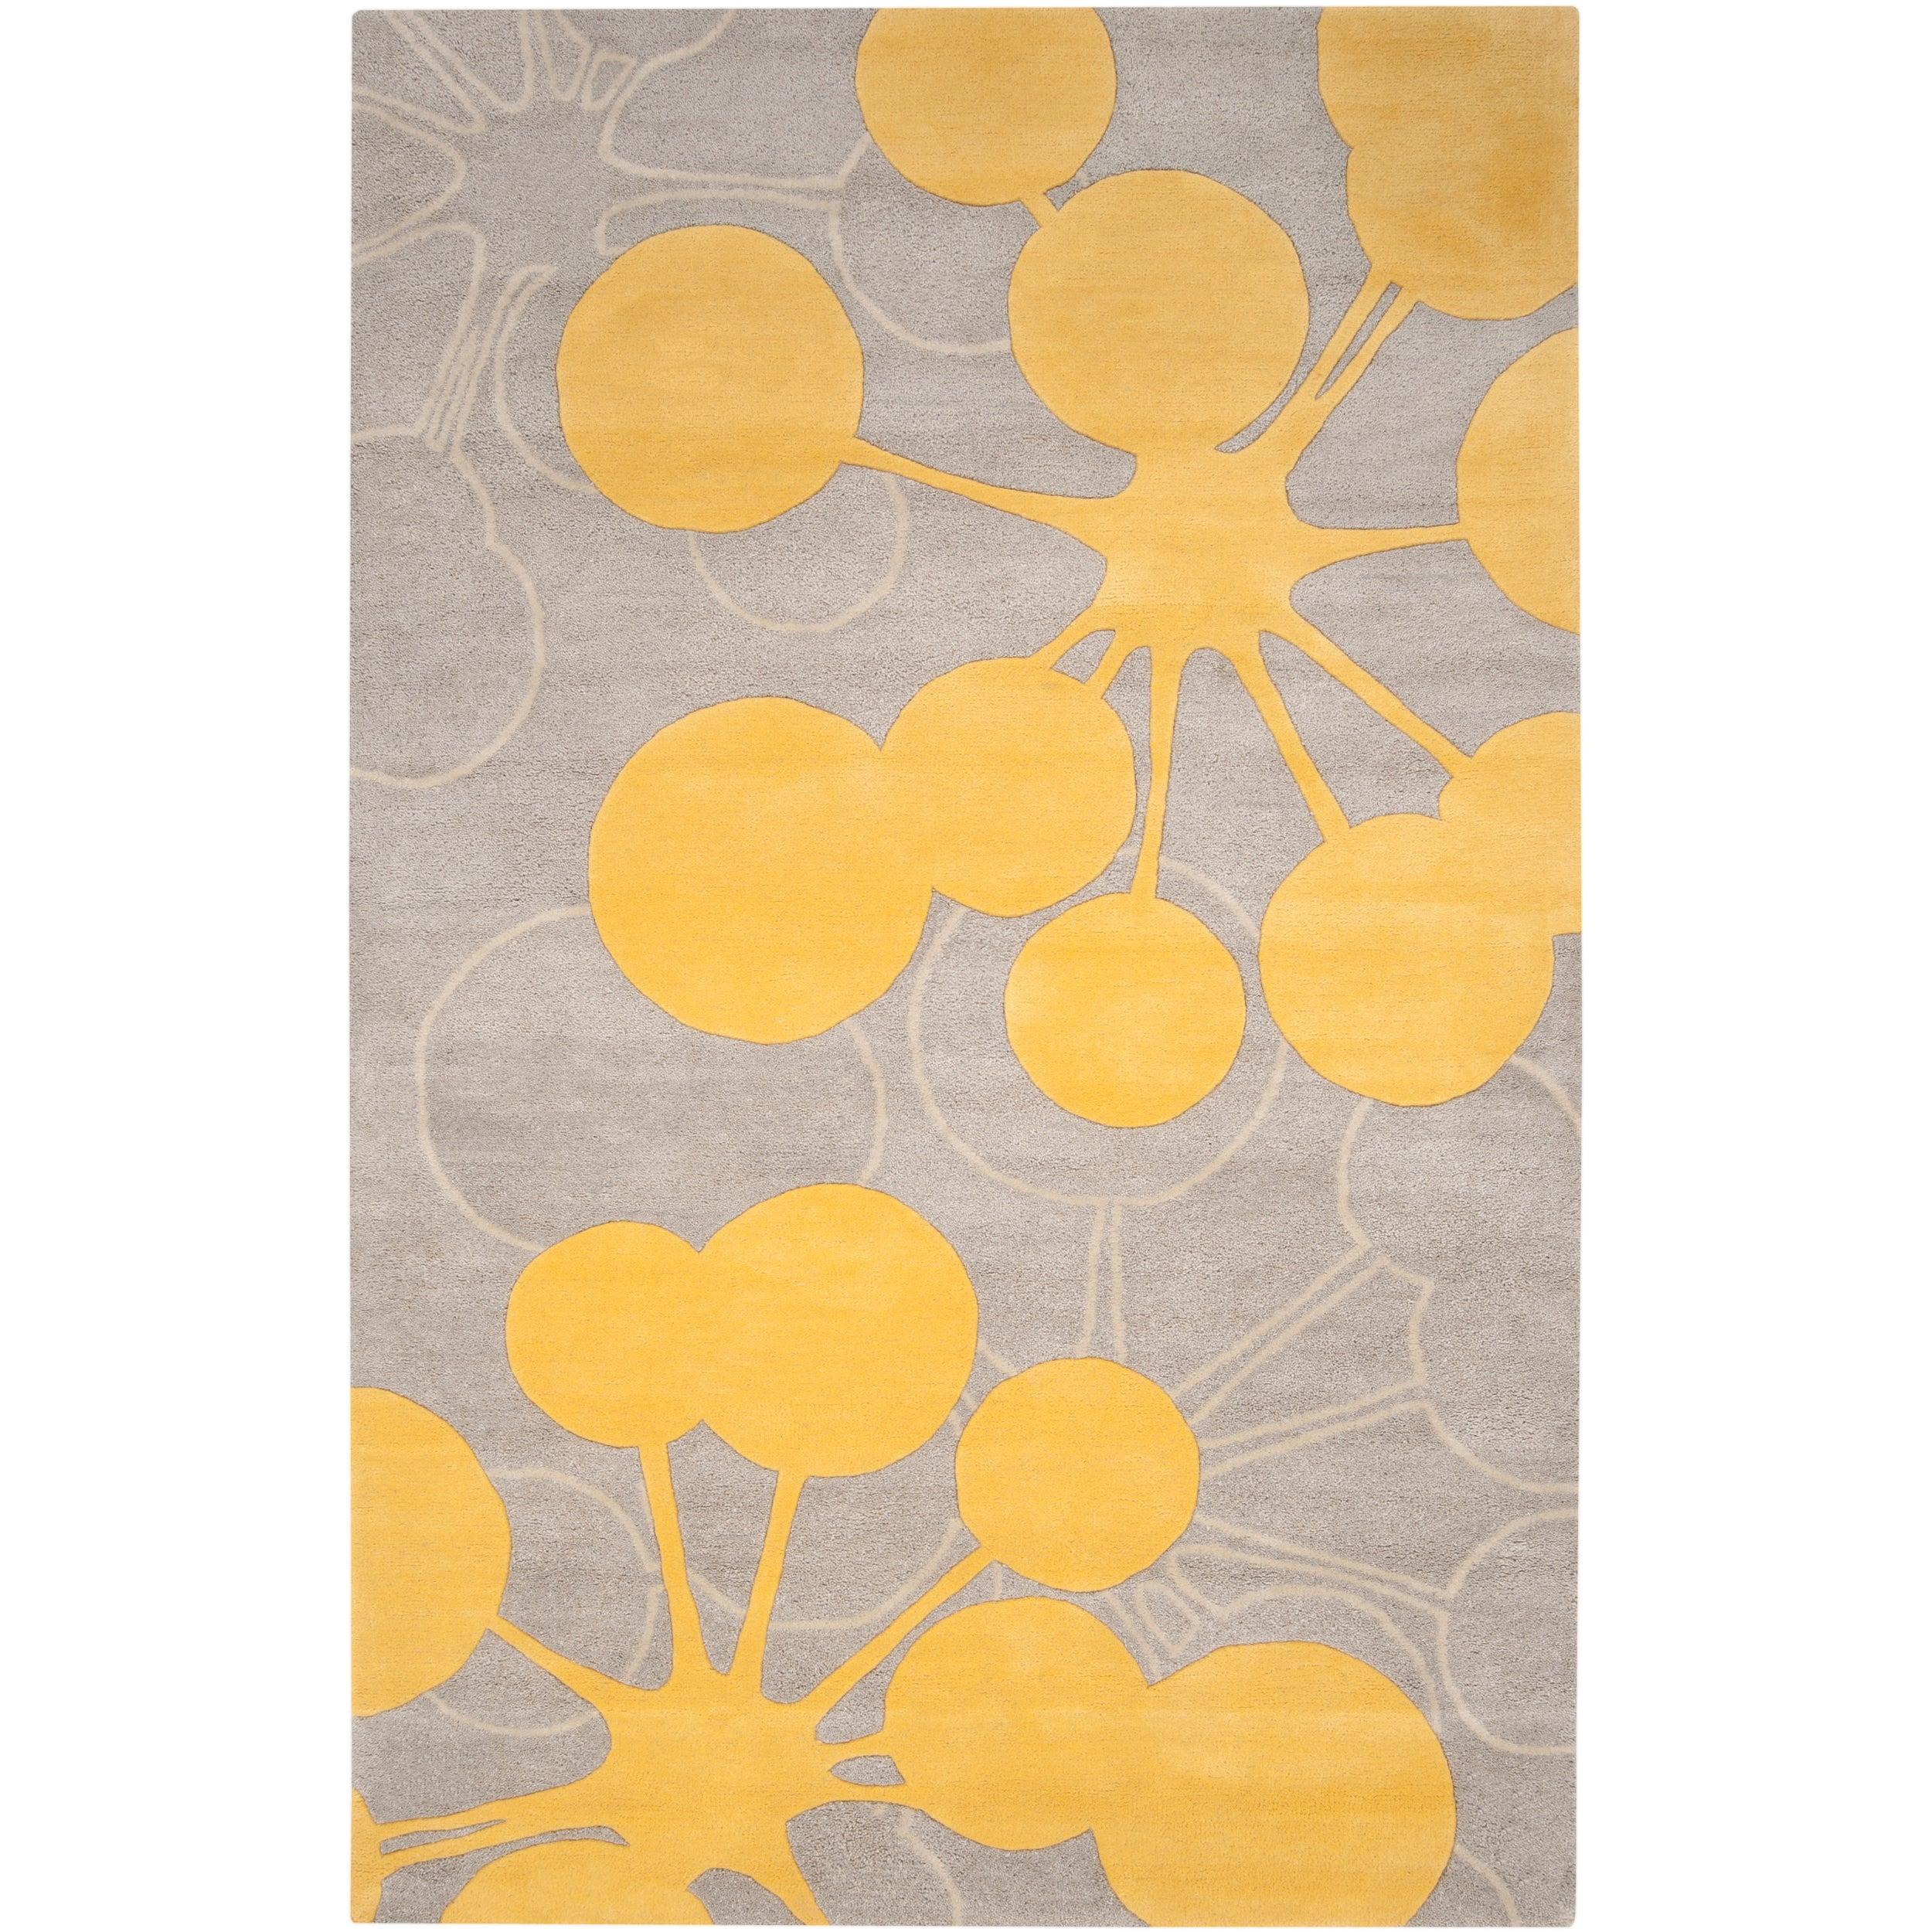 Jef designs hand tufted grey yellow contemporary halesowen for 7x9 bathroom designs